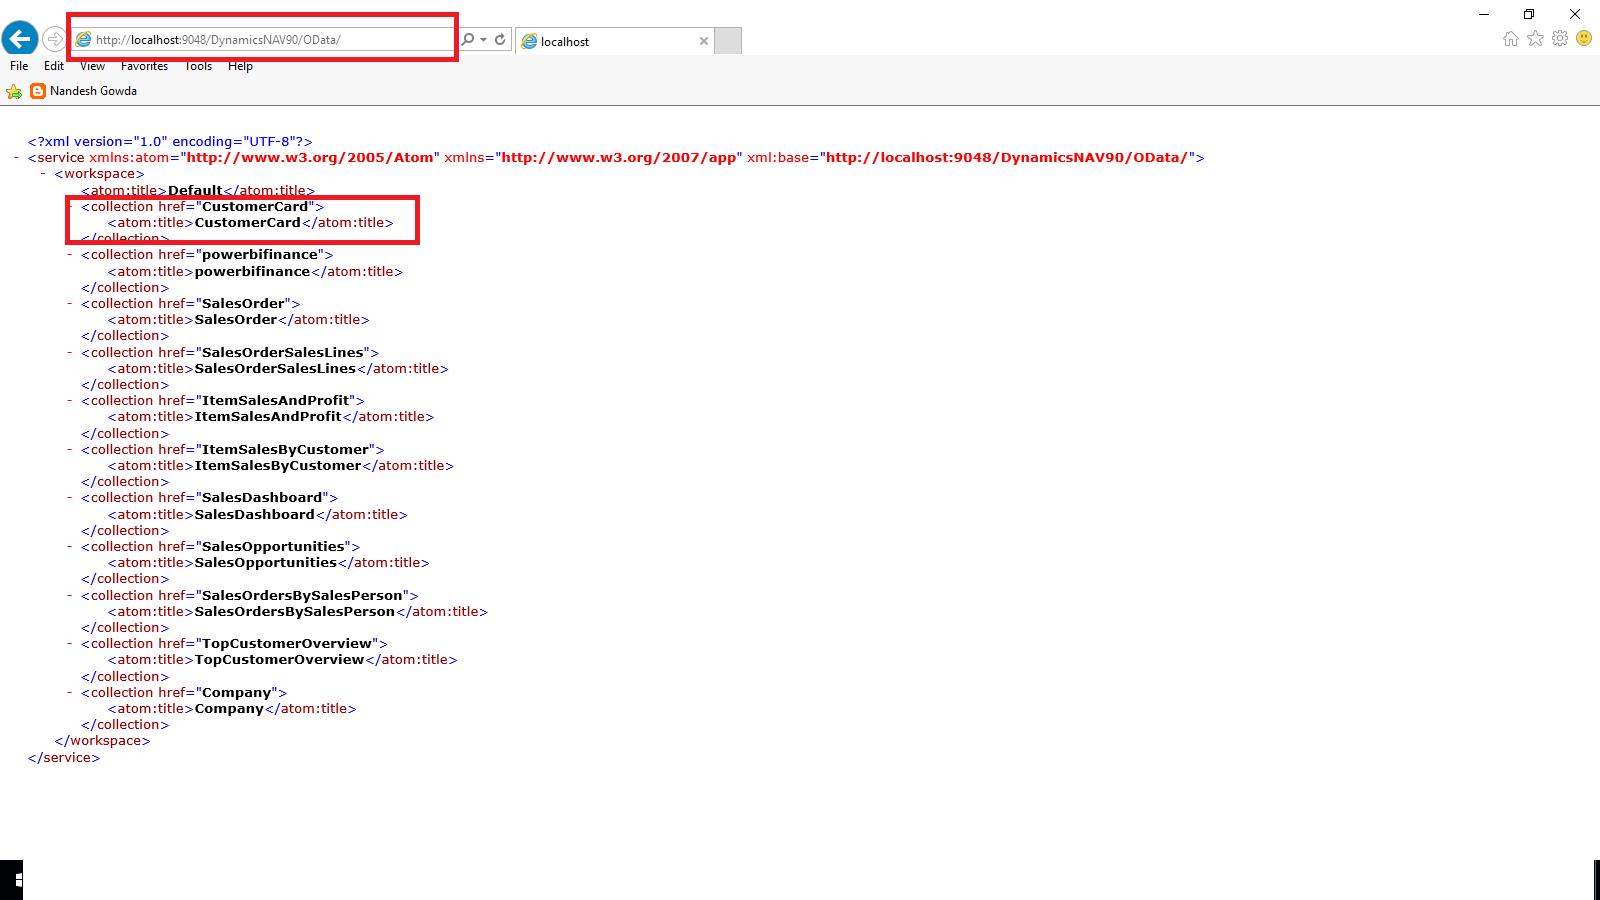 Workbooks workbook xmlns : Nandesh Gowda : Viewing Page Data in Excel Using PowerPivot (OData ...